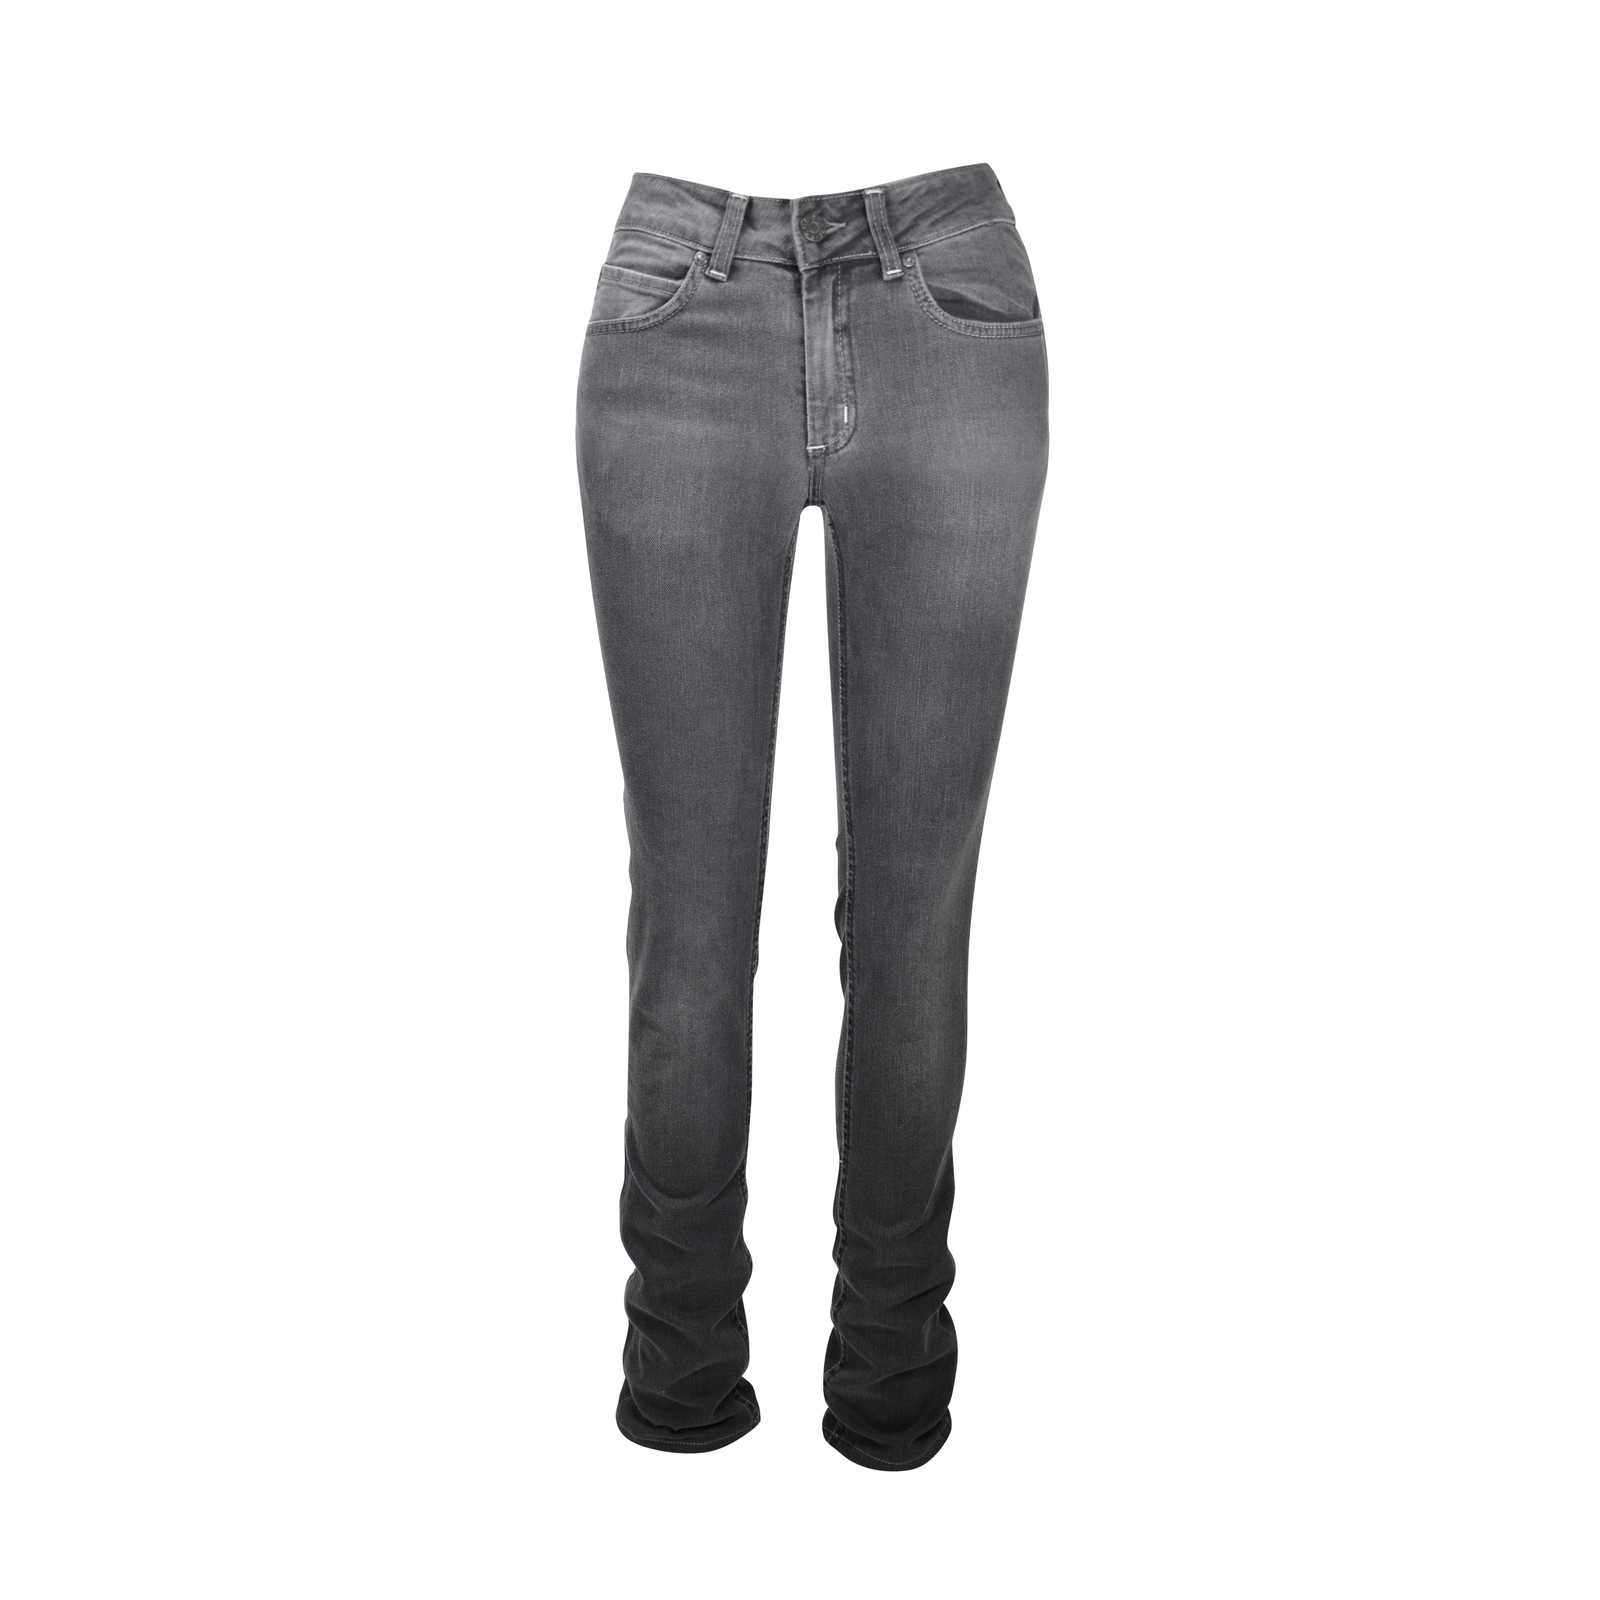 ACNE STUDIOS  Gradient Jeans